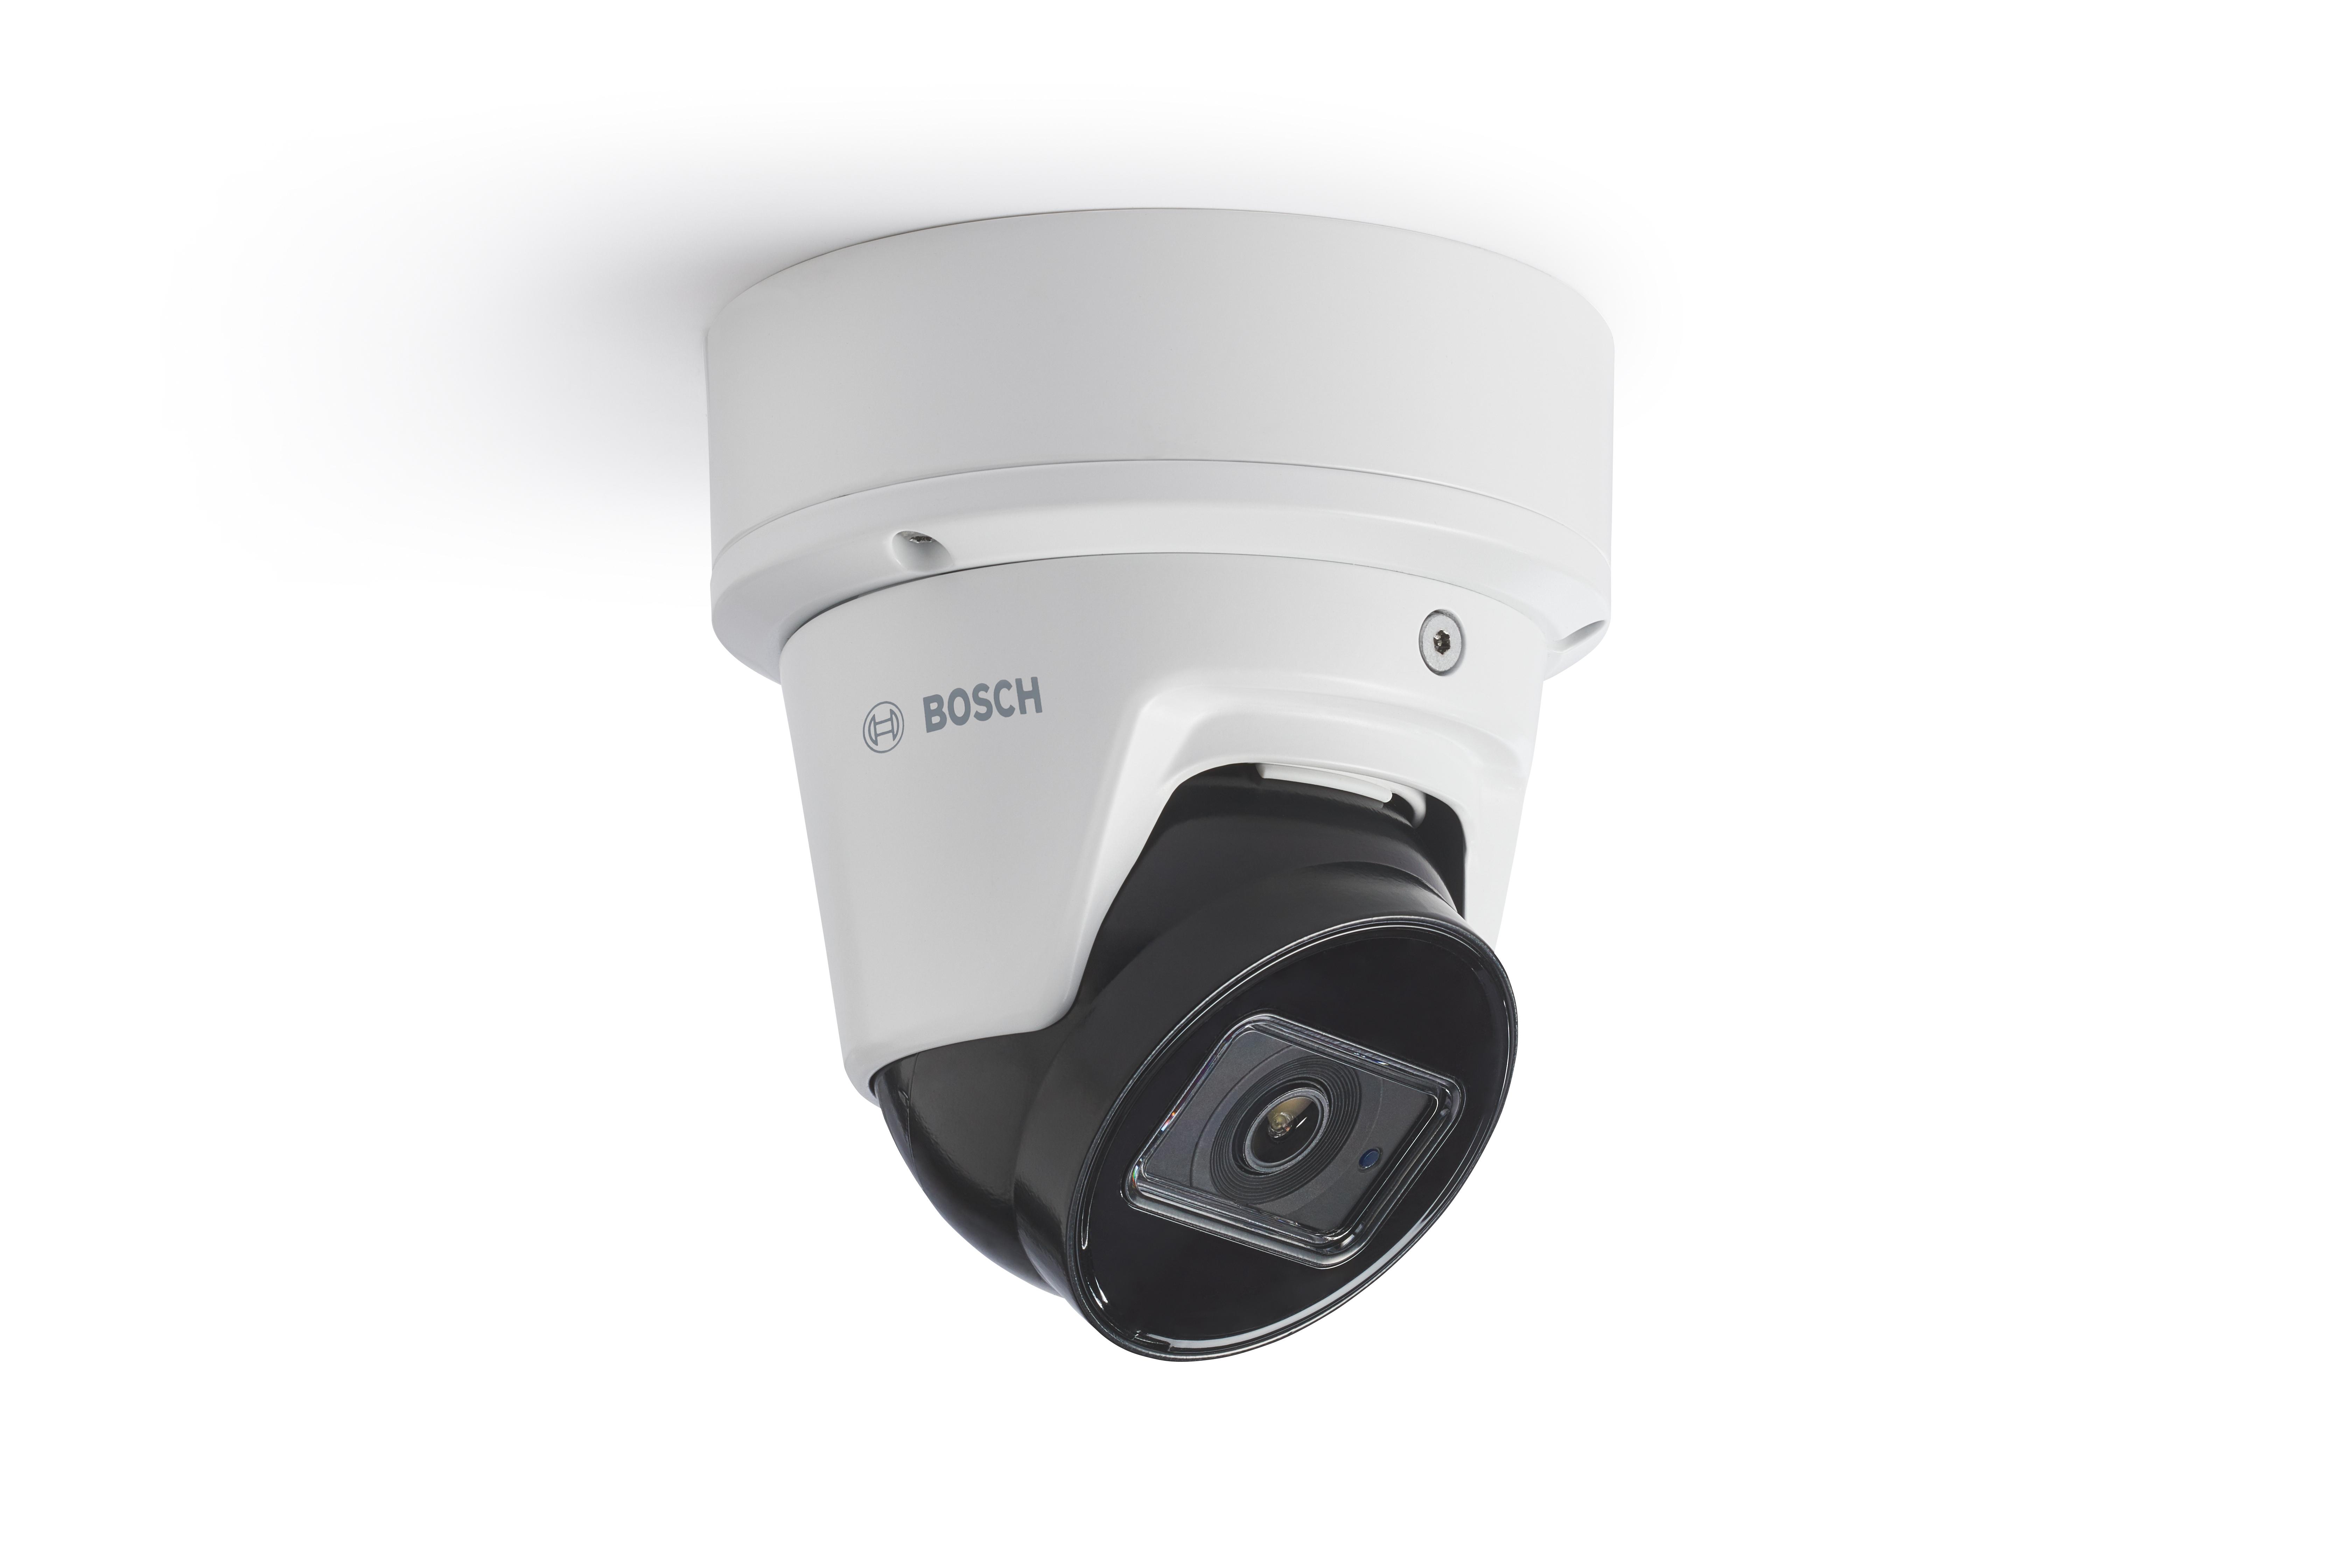 Bosch NTV-3502-F02L